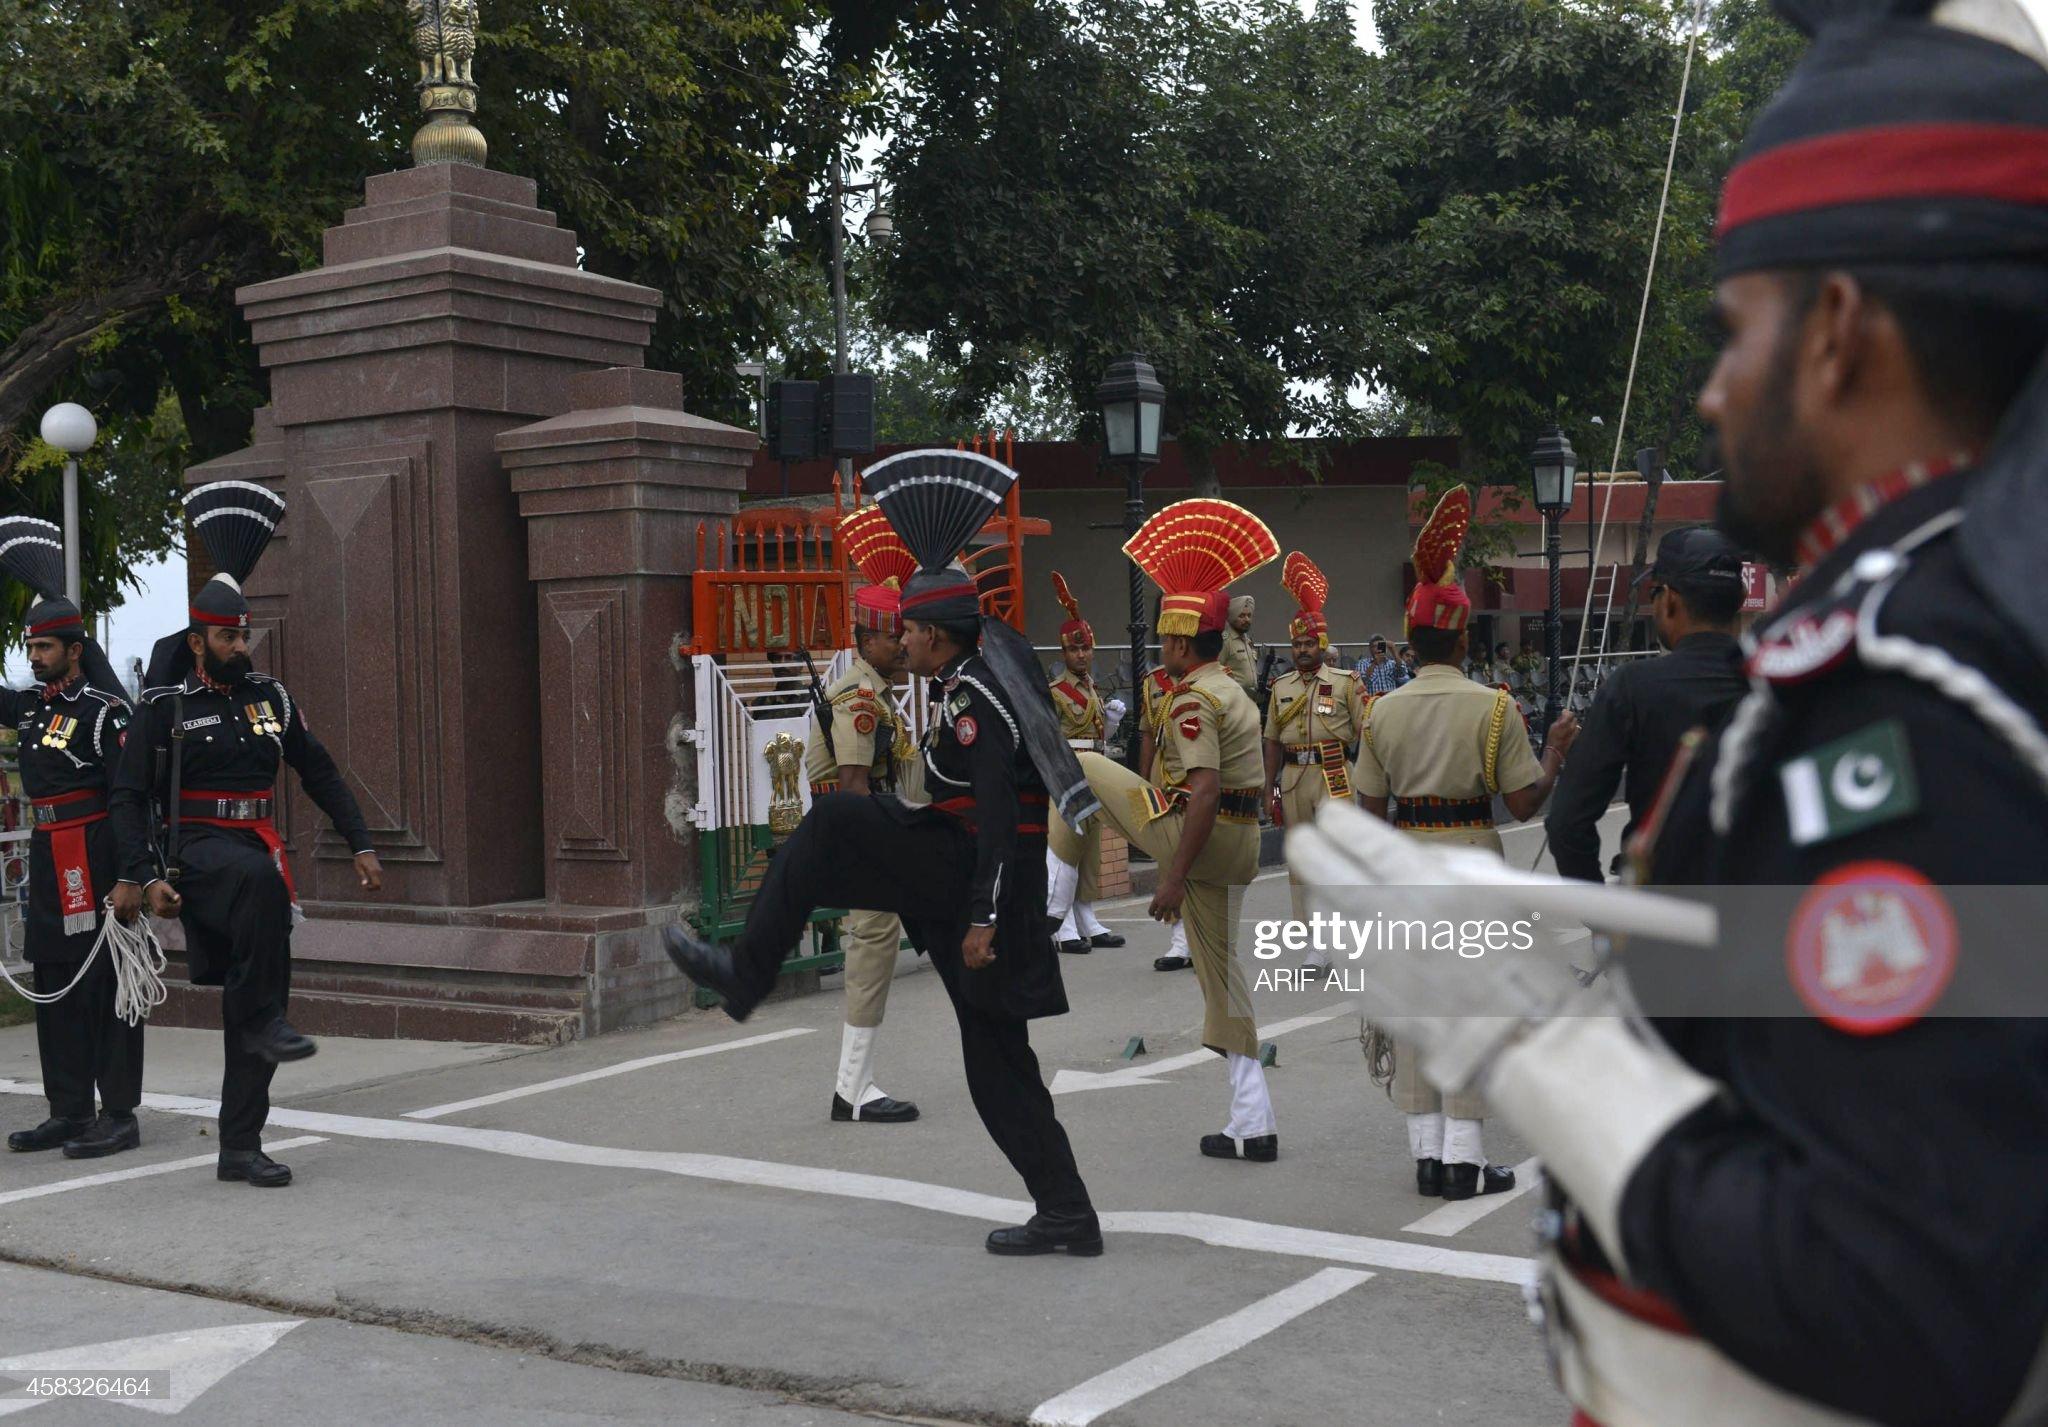 PAKISTAN-UNREST-BLAST-INDIA : News Photo